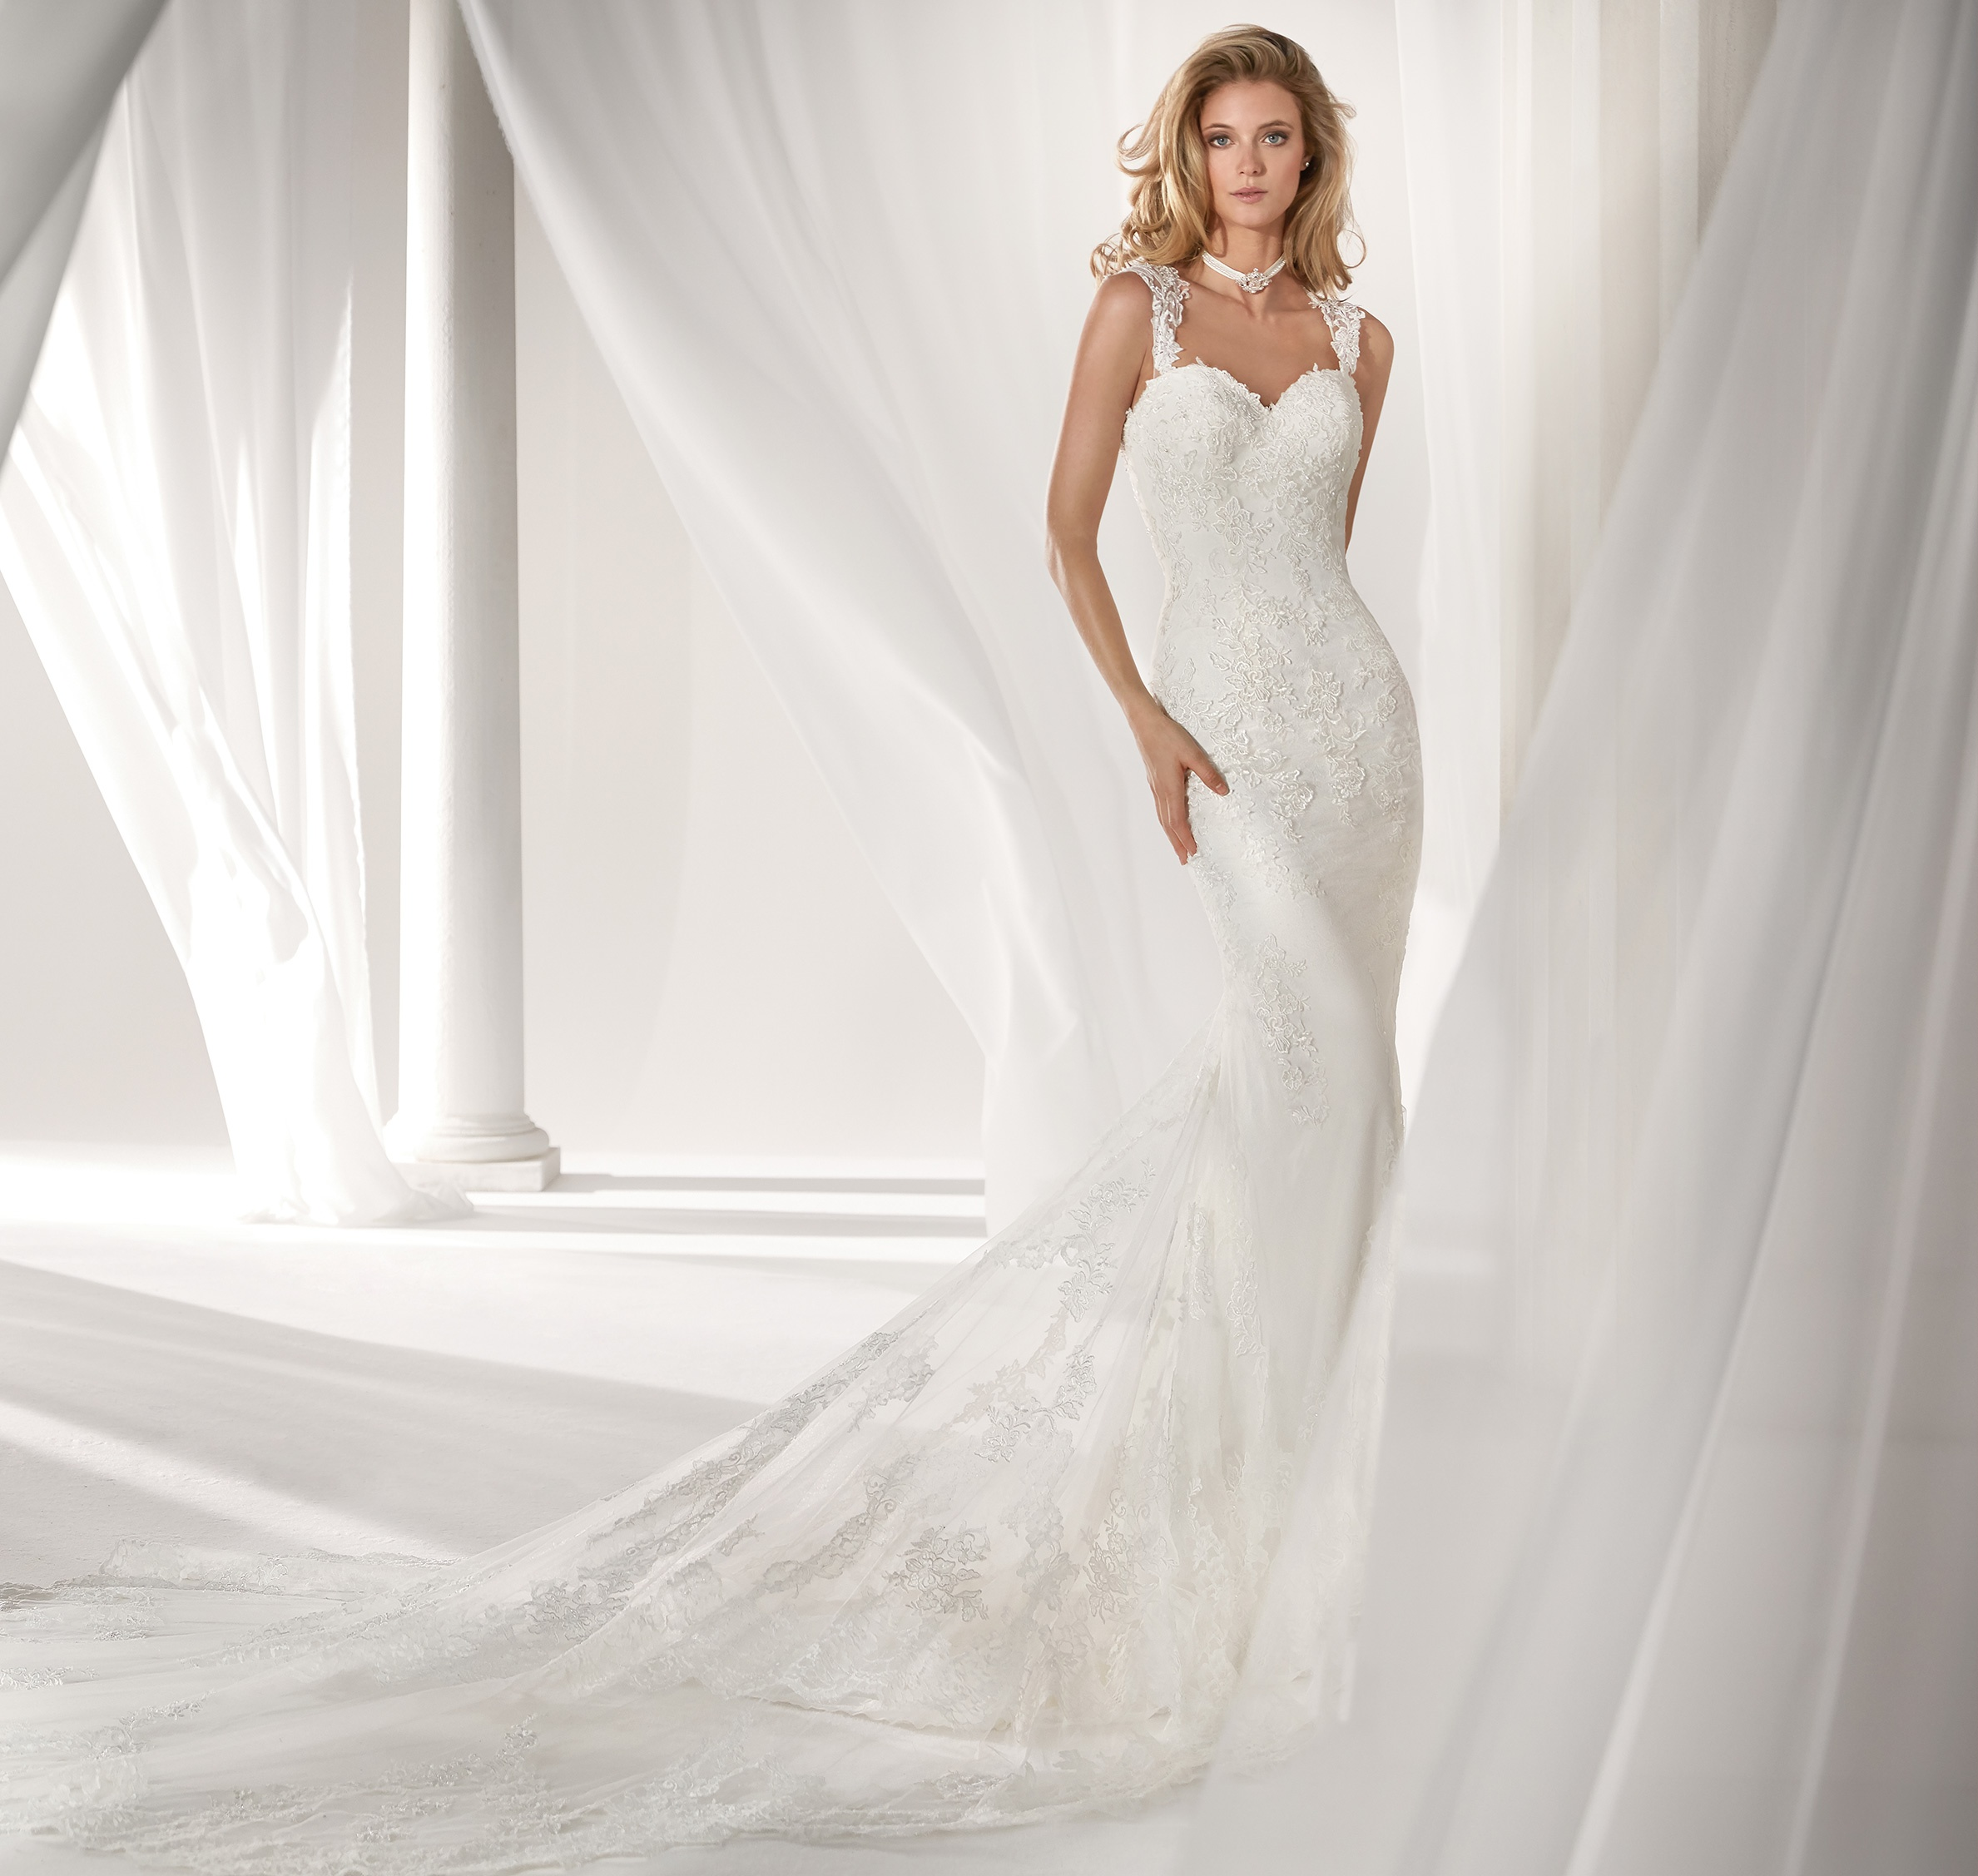 nicole-spose-NIAB19114-Nicole-moda-sposa-2019-440.jpg